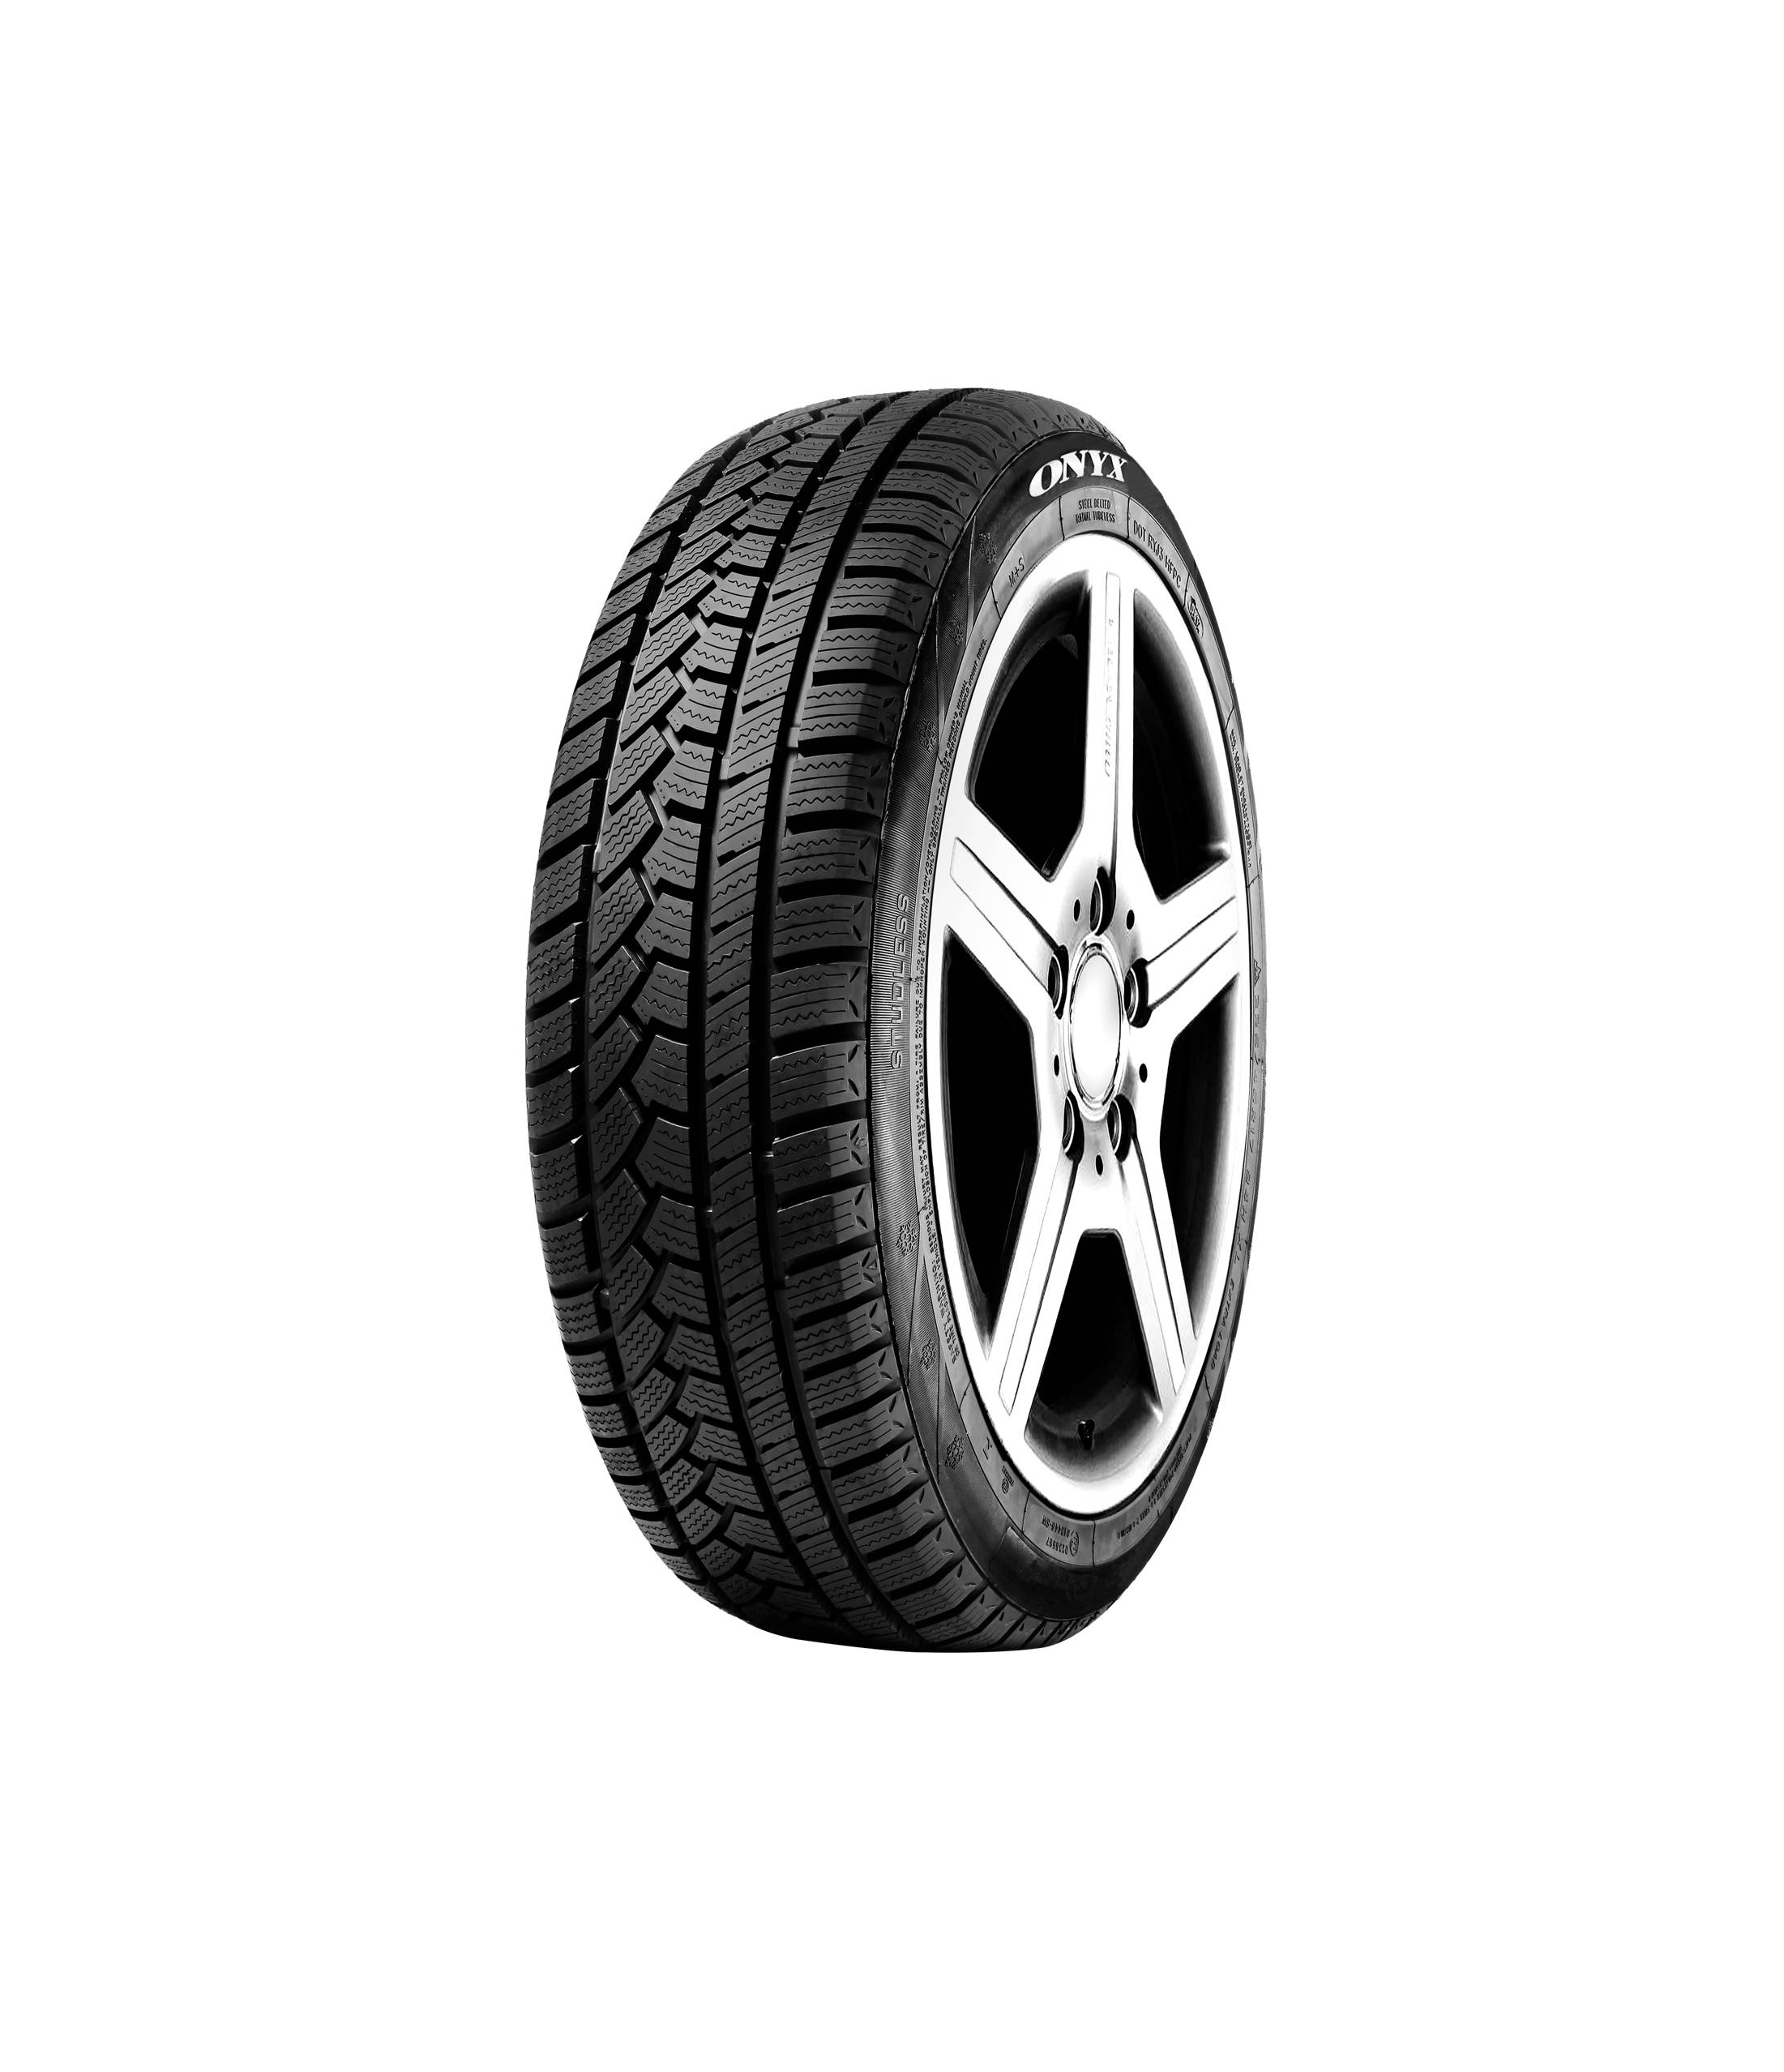 Onyx NY-W702 195/55 R15 85H téli gumi